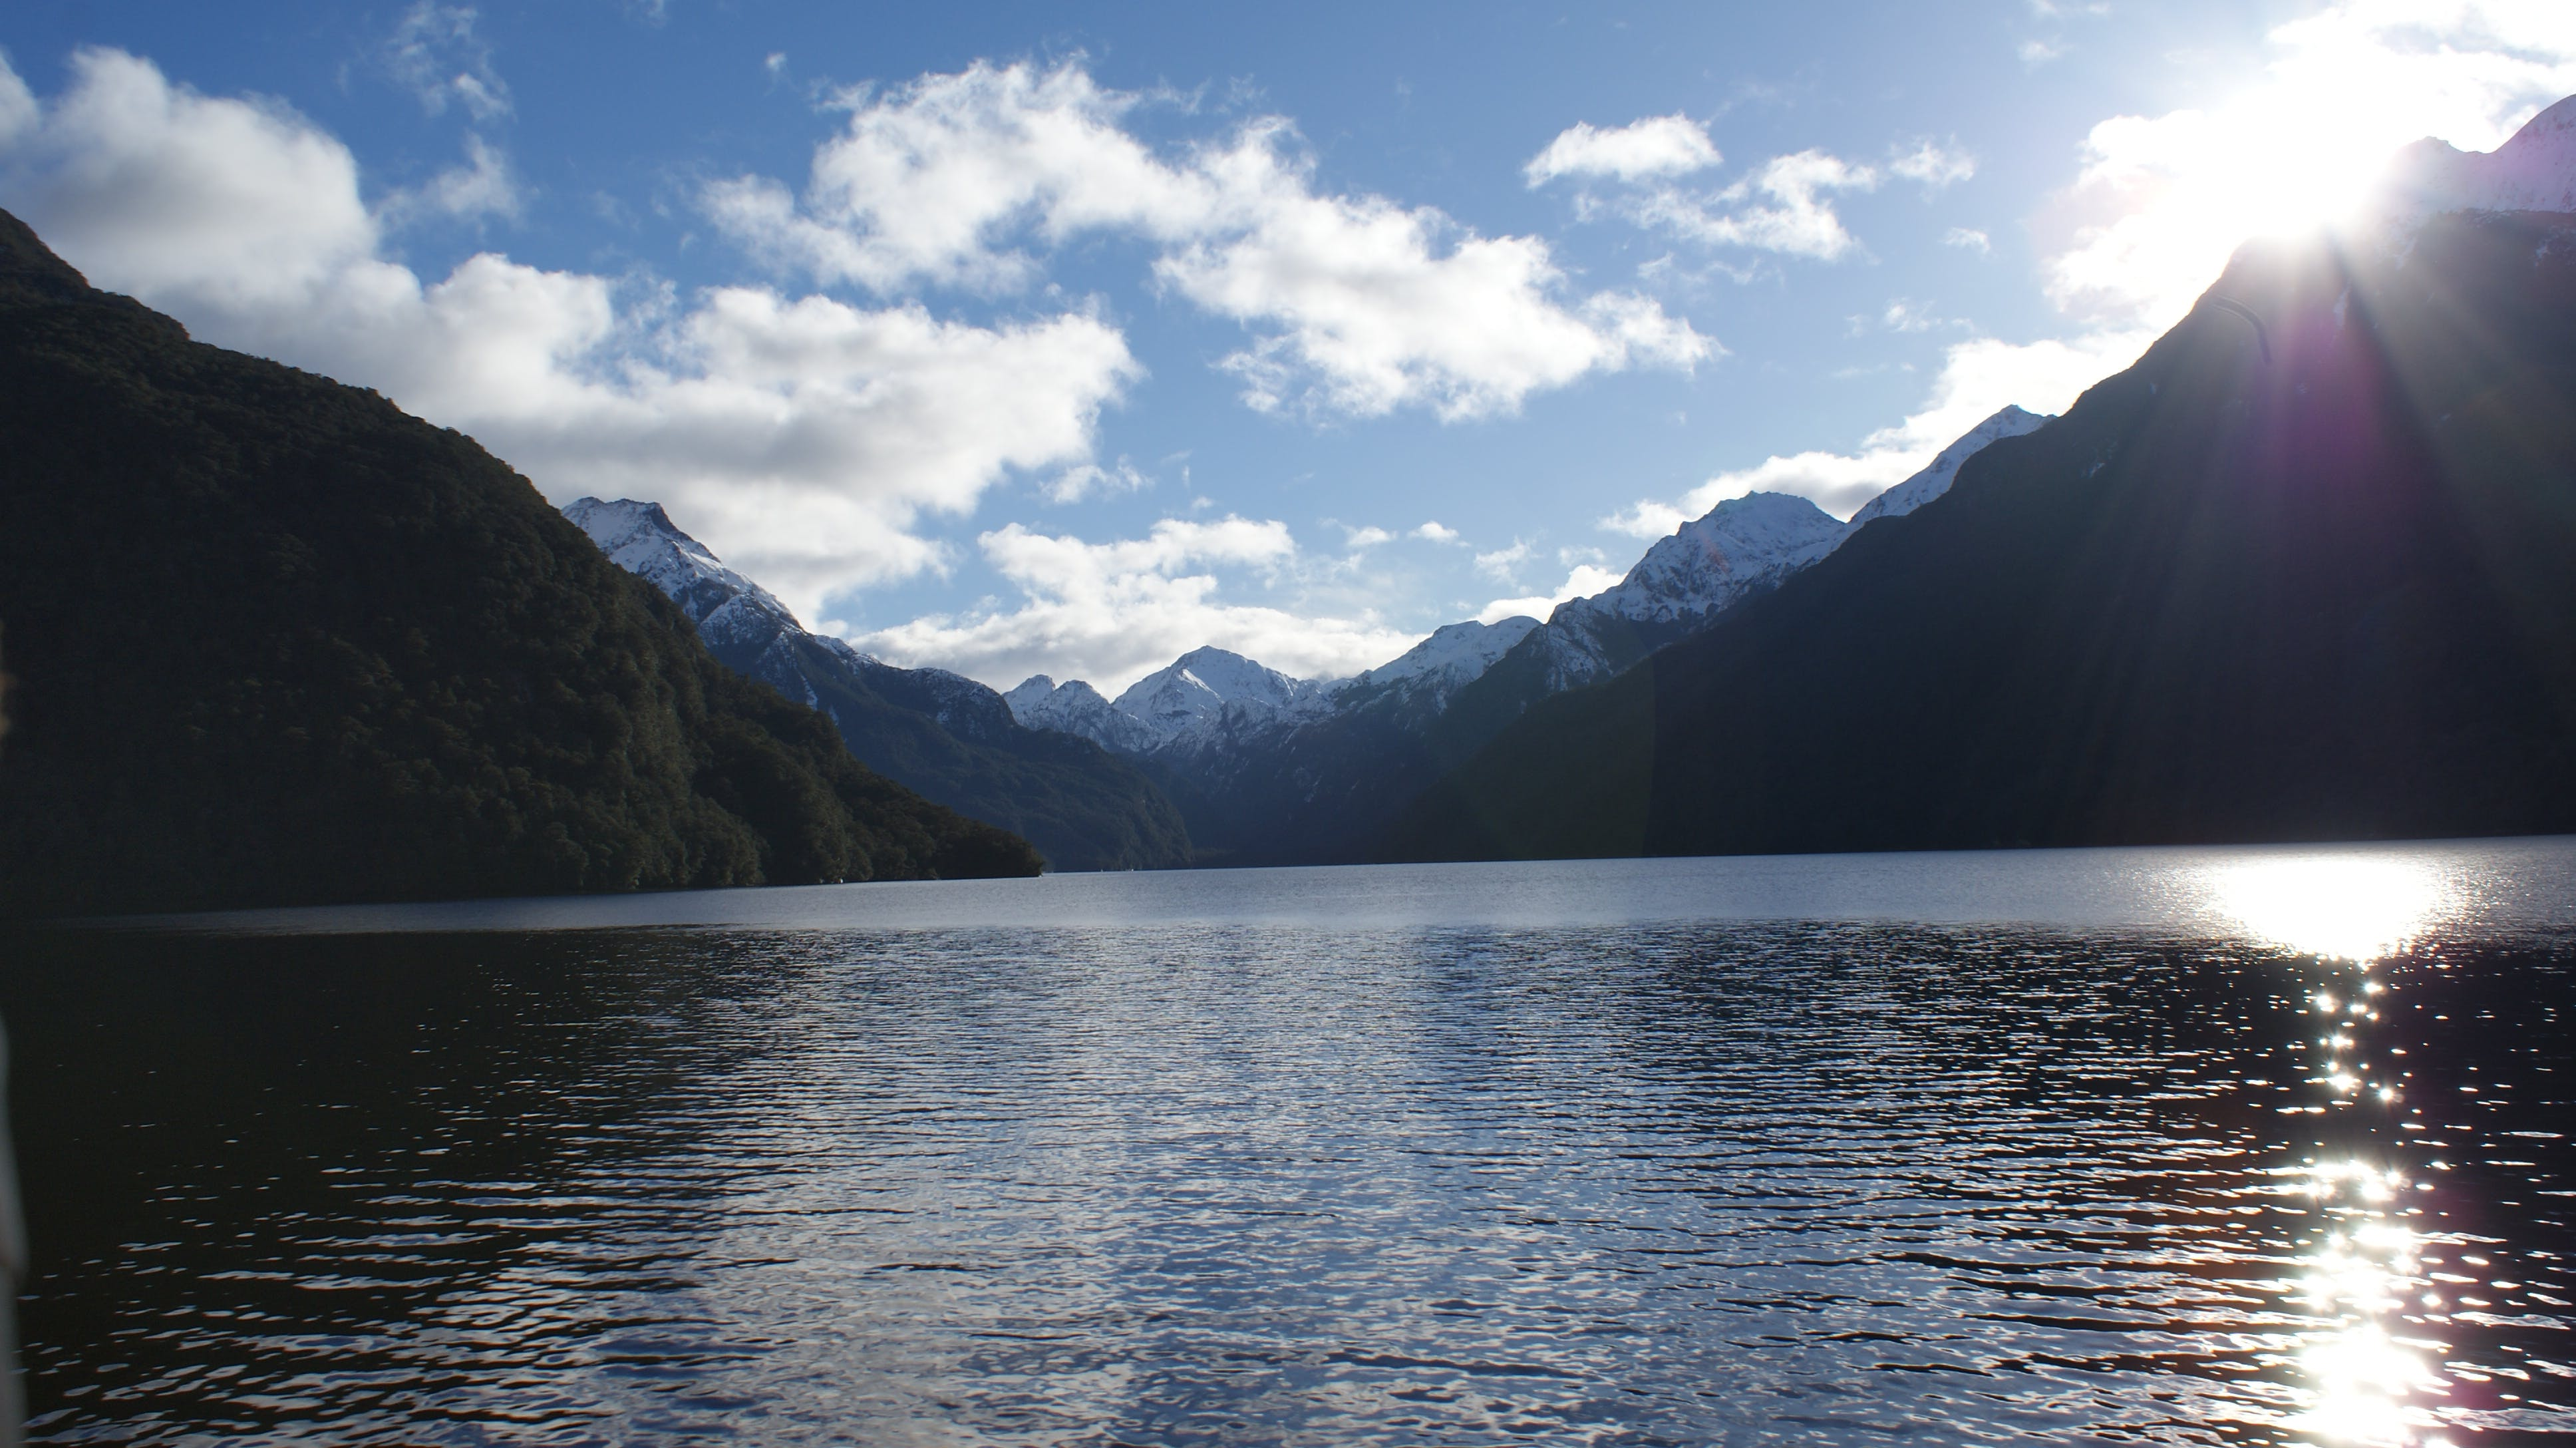 Kostenloses Stock Foto zu berge, fluss, himmel, landschaft